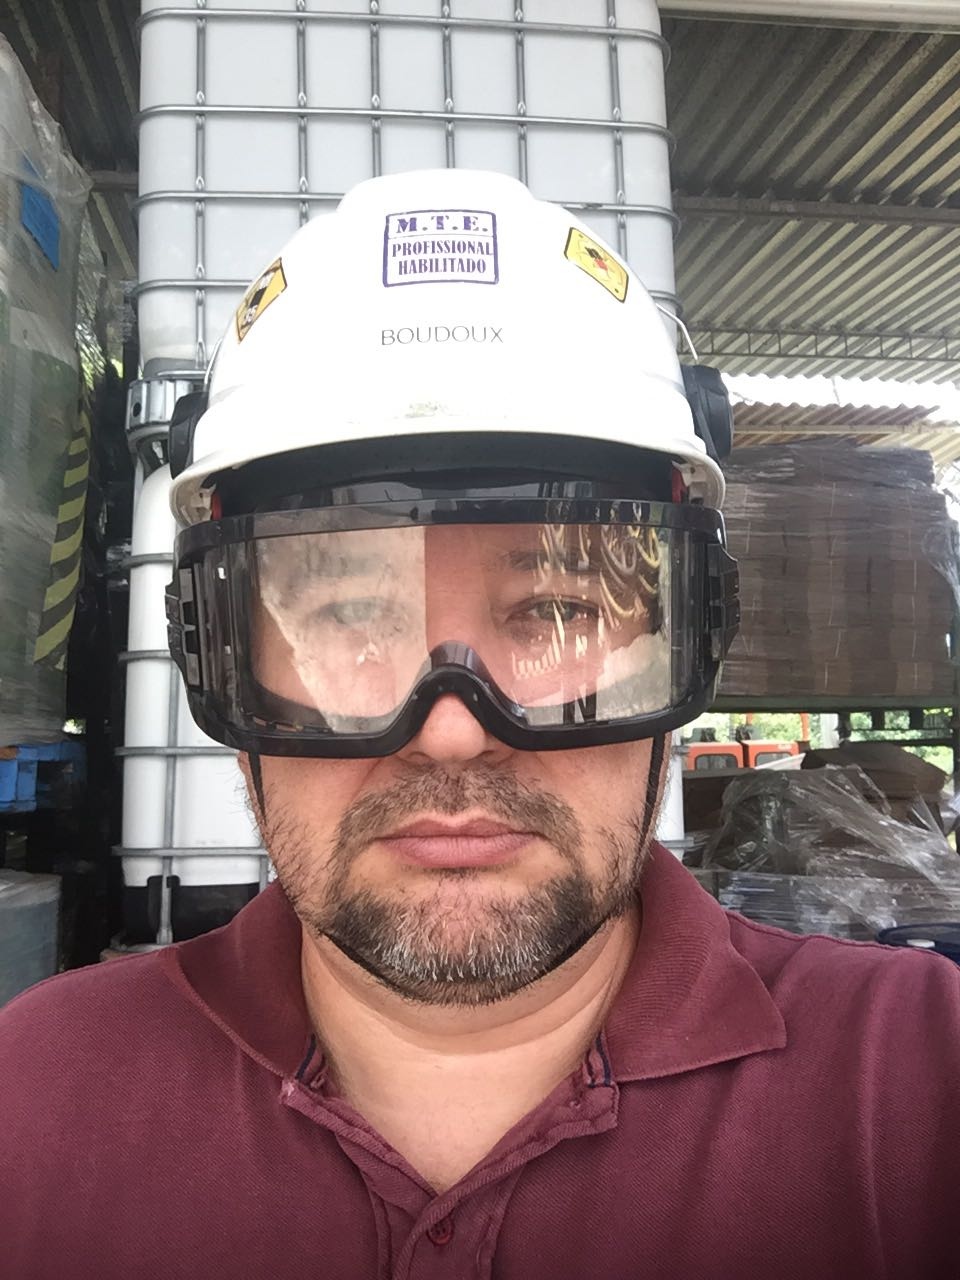 Joselito Boudoux da Silva